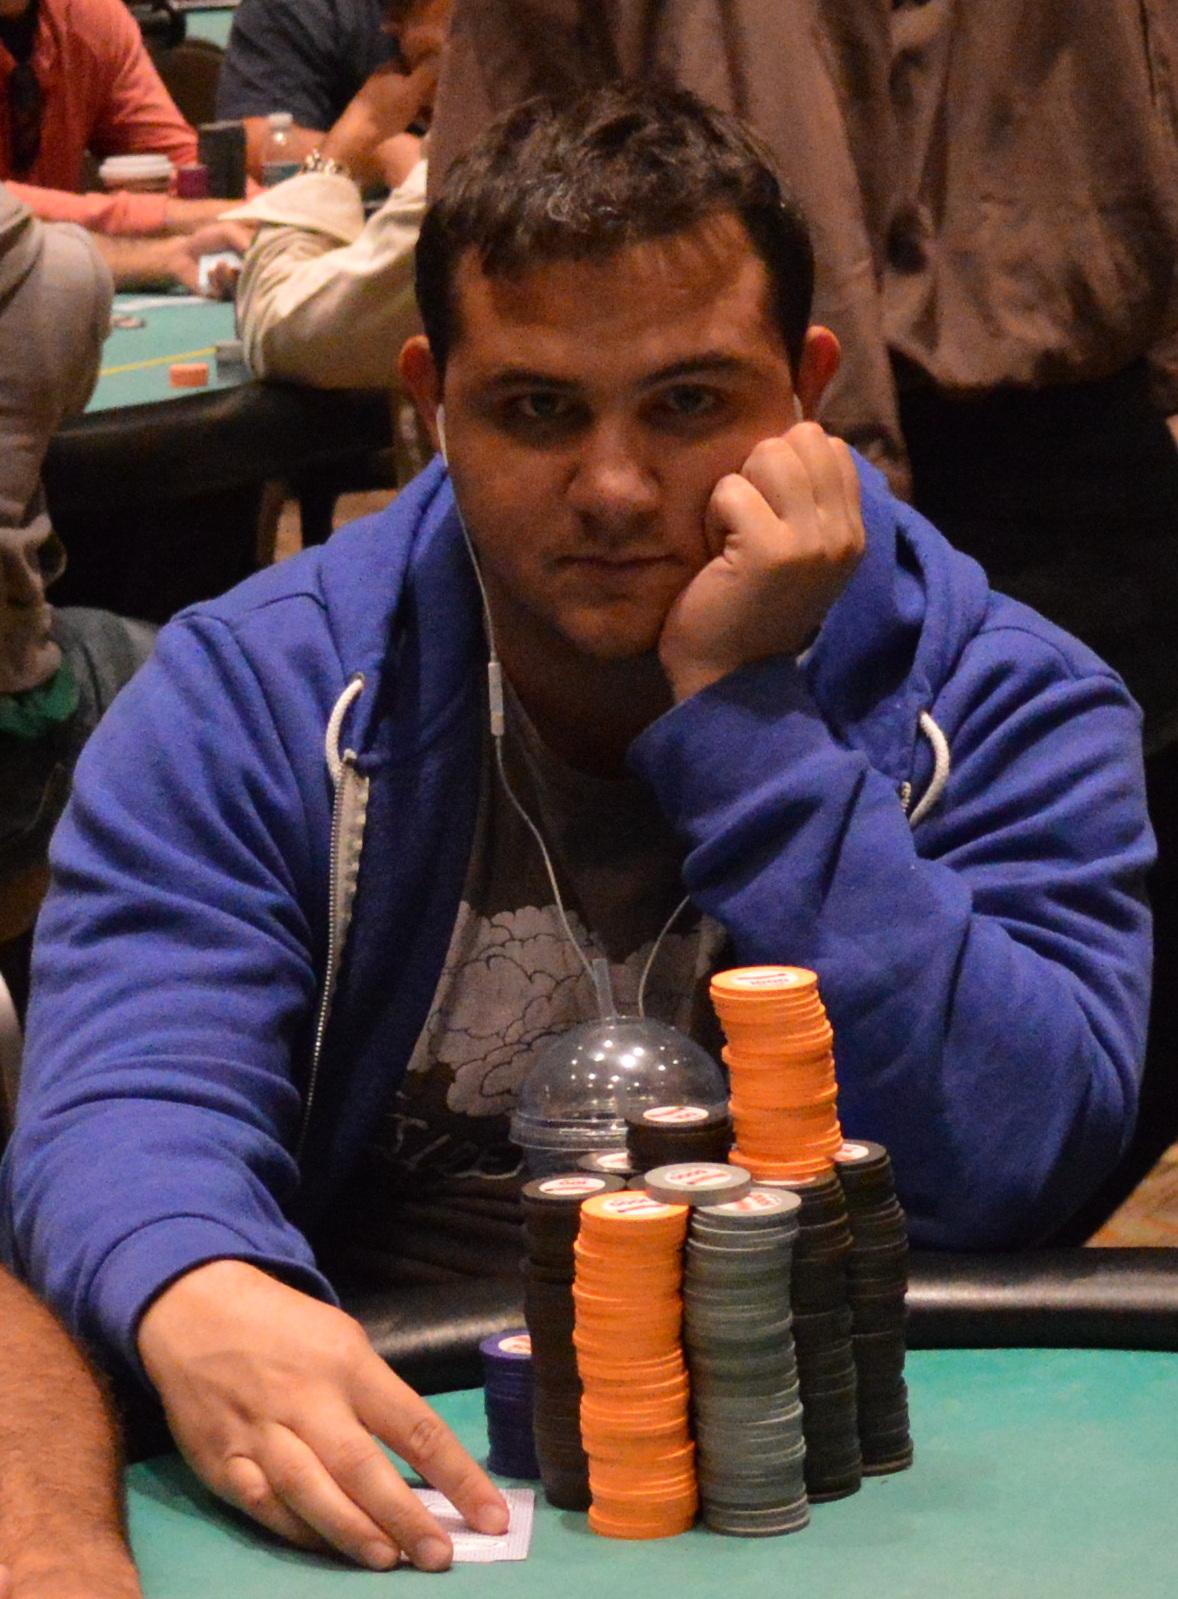 Borgata poker open 2013 event 8 big stacks sharing felt for Peter ippolito